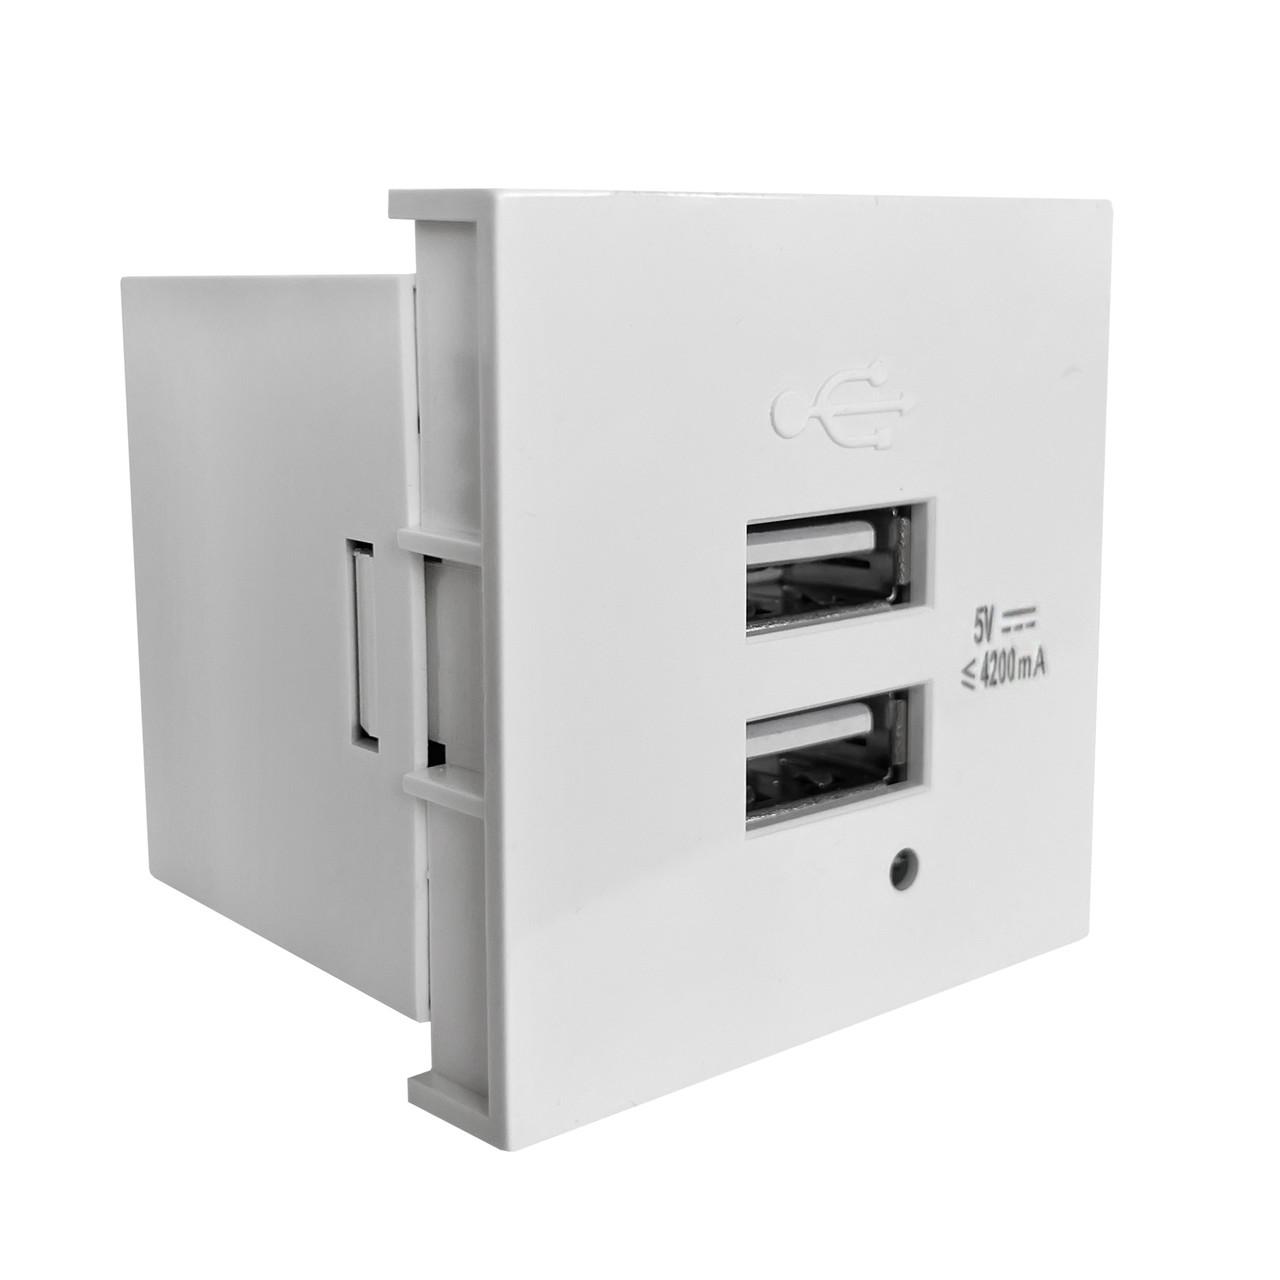 Shelbi Розетка зарядка 2- портовая USB, 4.2A, 45х45, белая